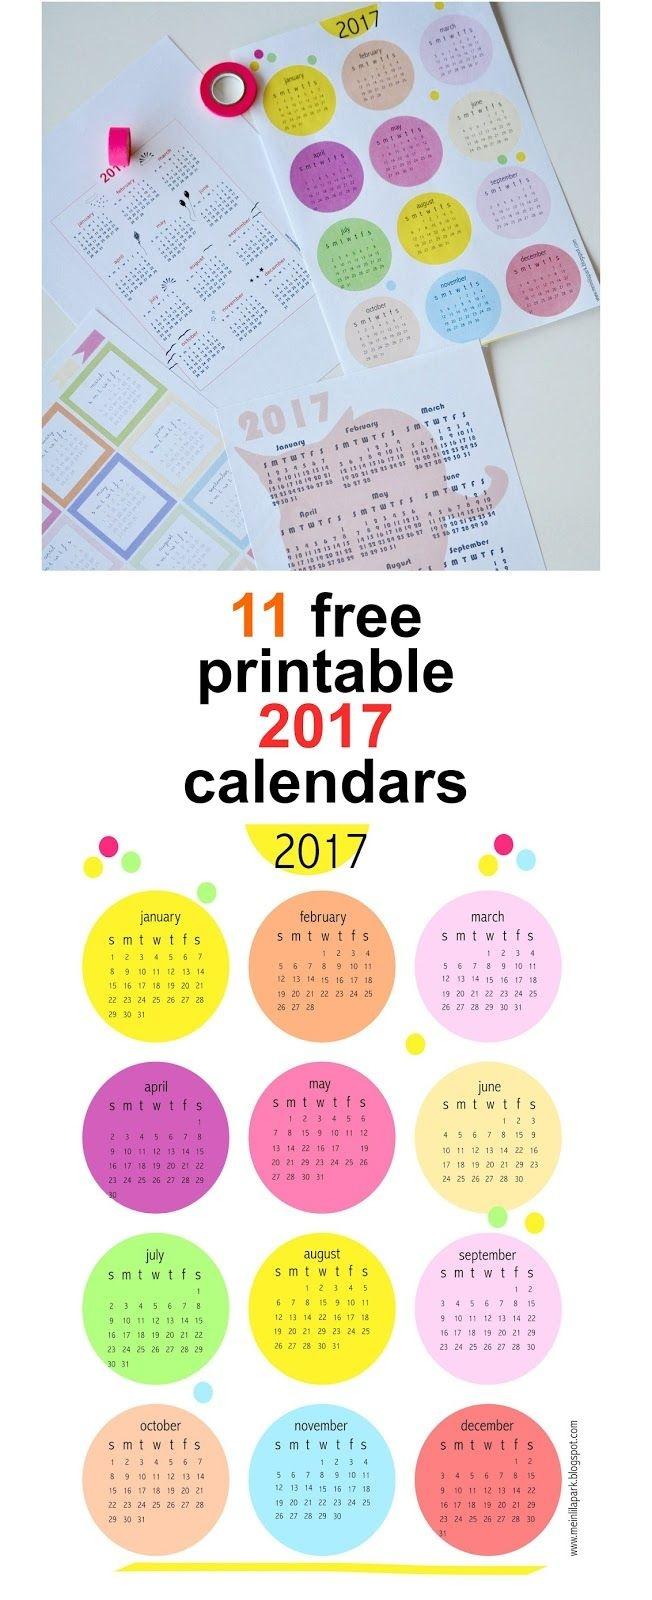 Free Printable 2017 Calendars - Round-Up | Calendars | Calendar 2017 - Free Printable Agenda 2017